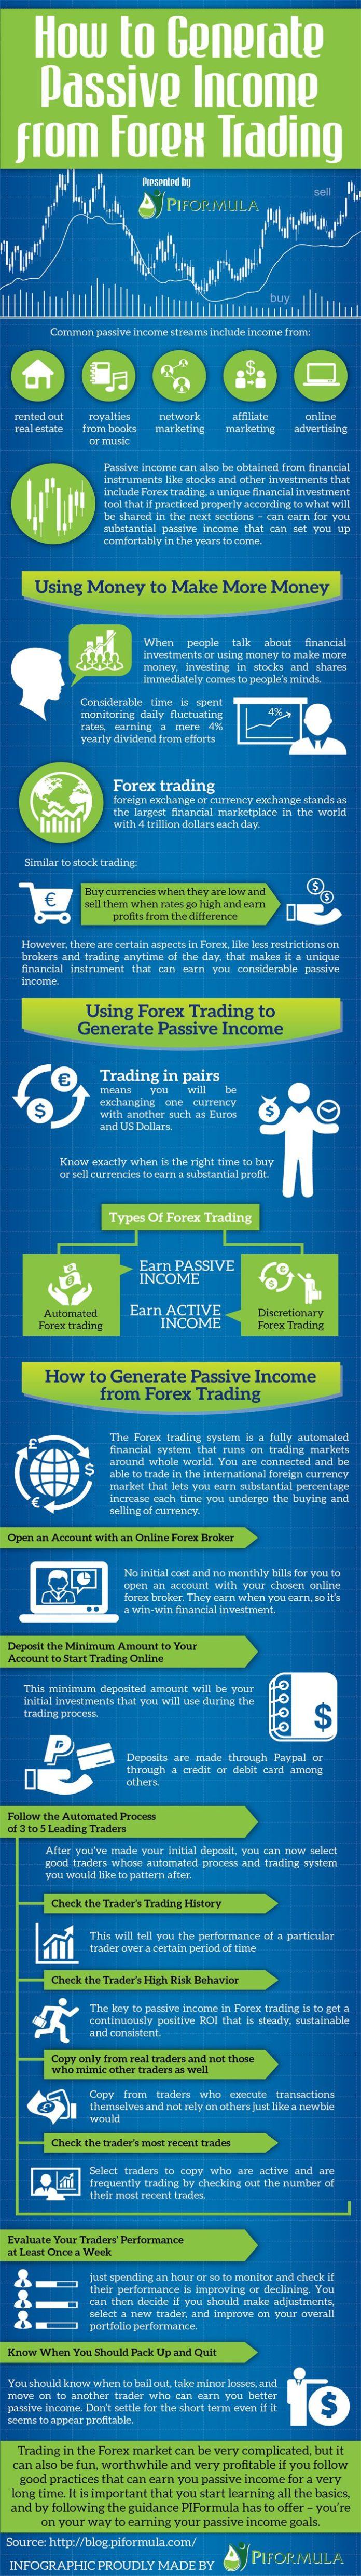 Esignal forex income generator